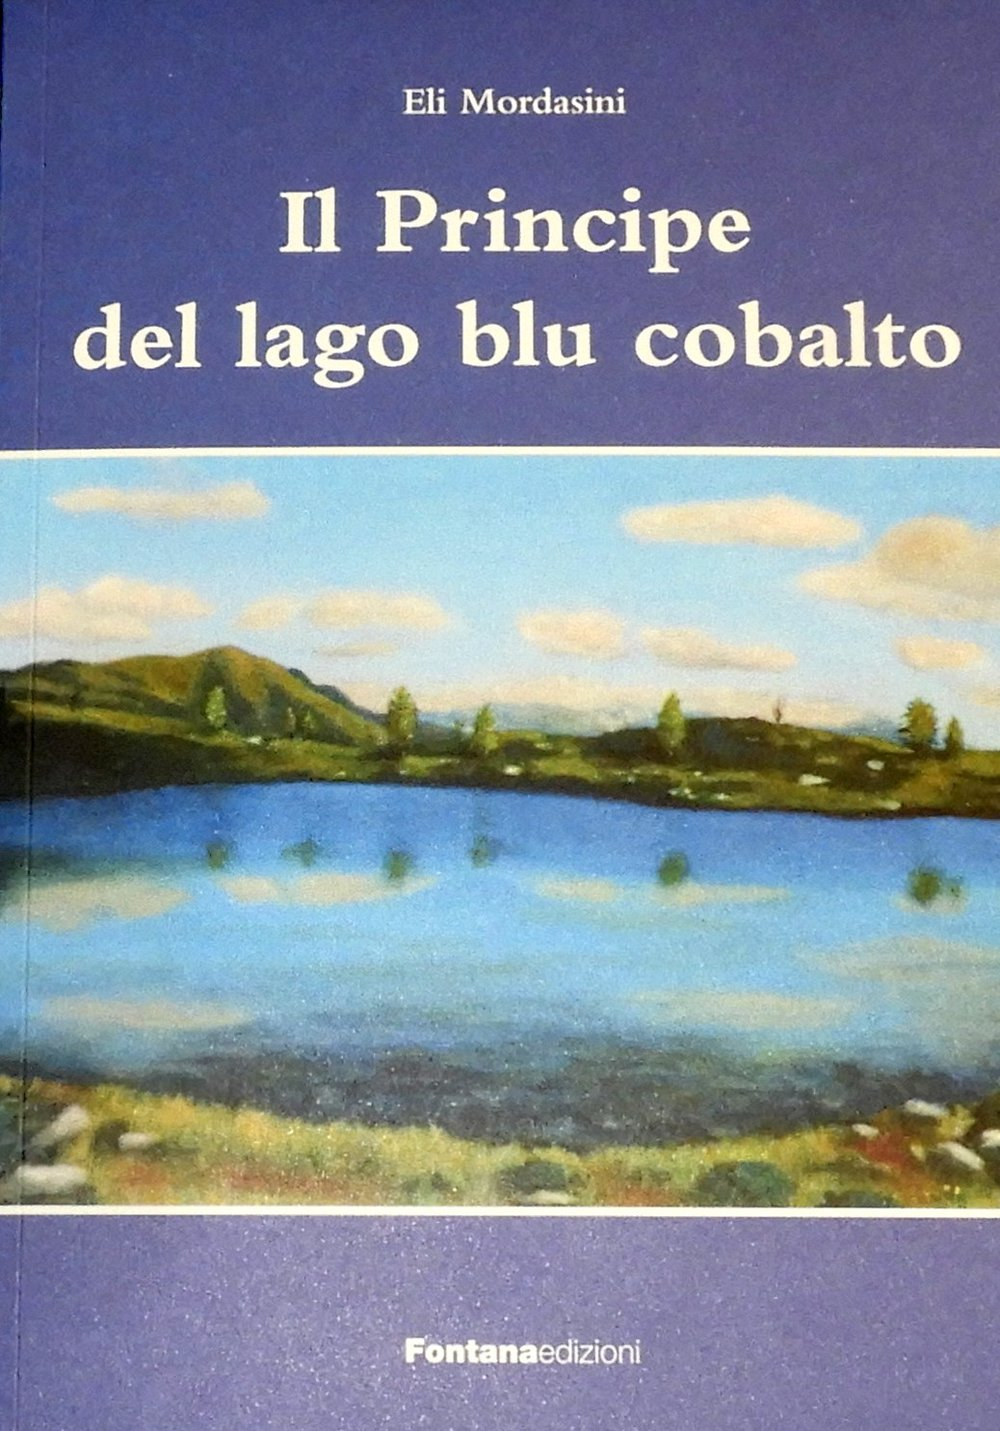 Principe del lago blu cobalto .JPG